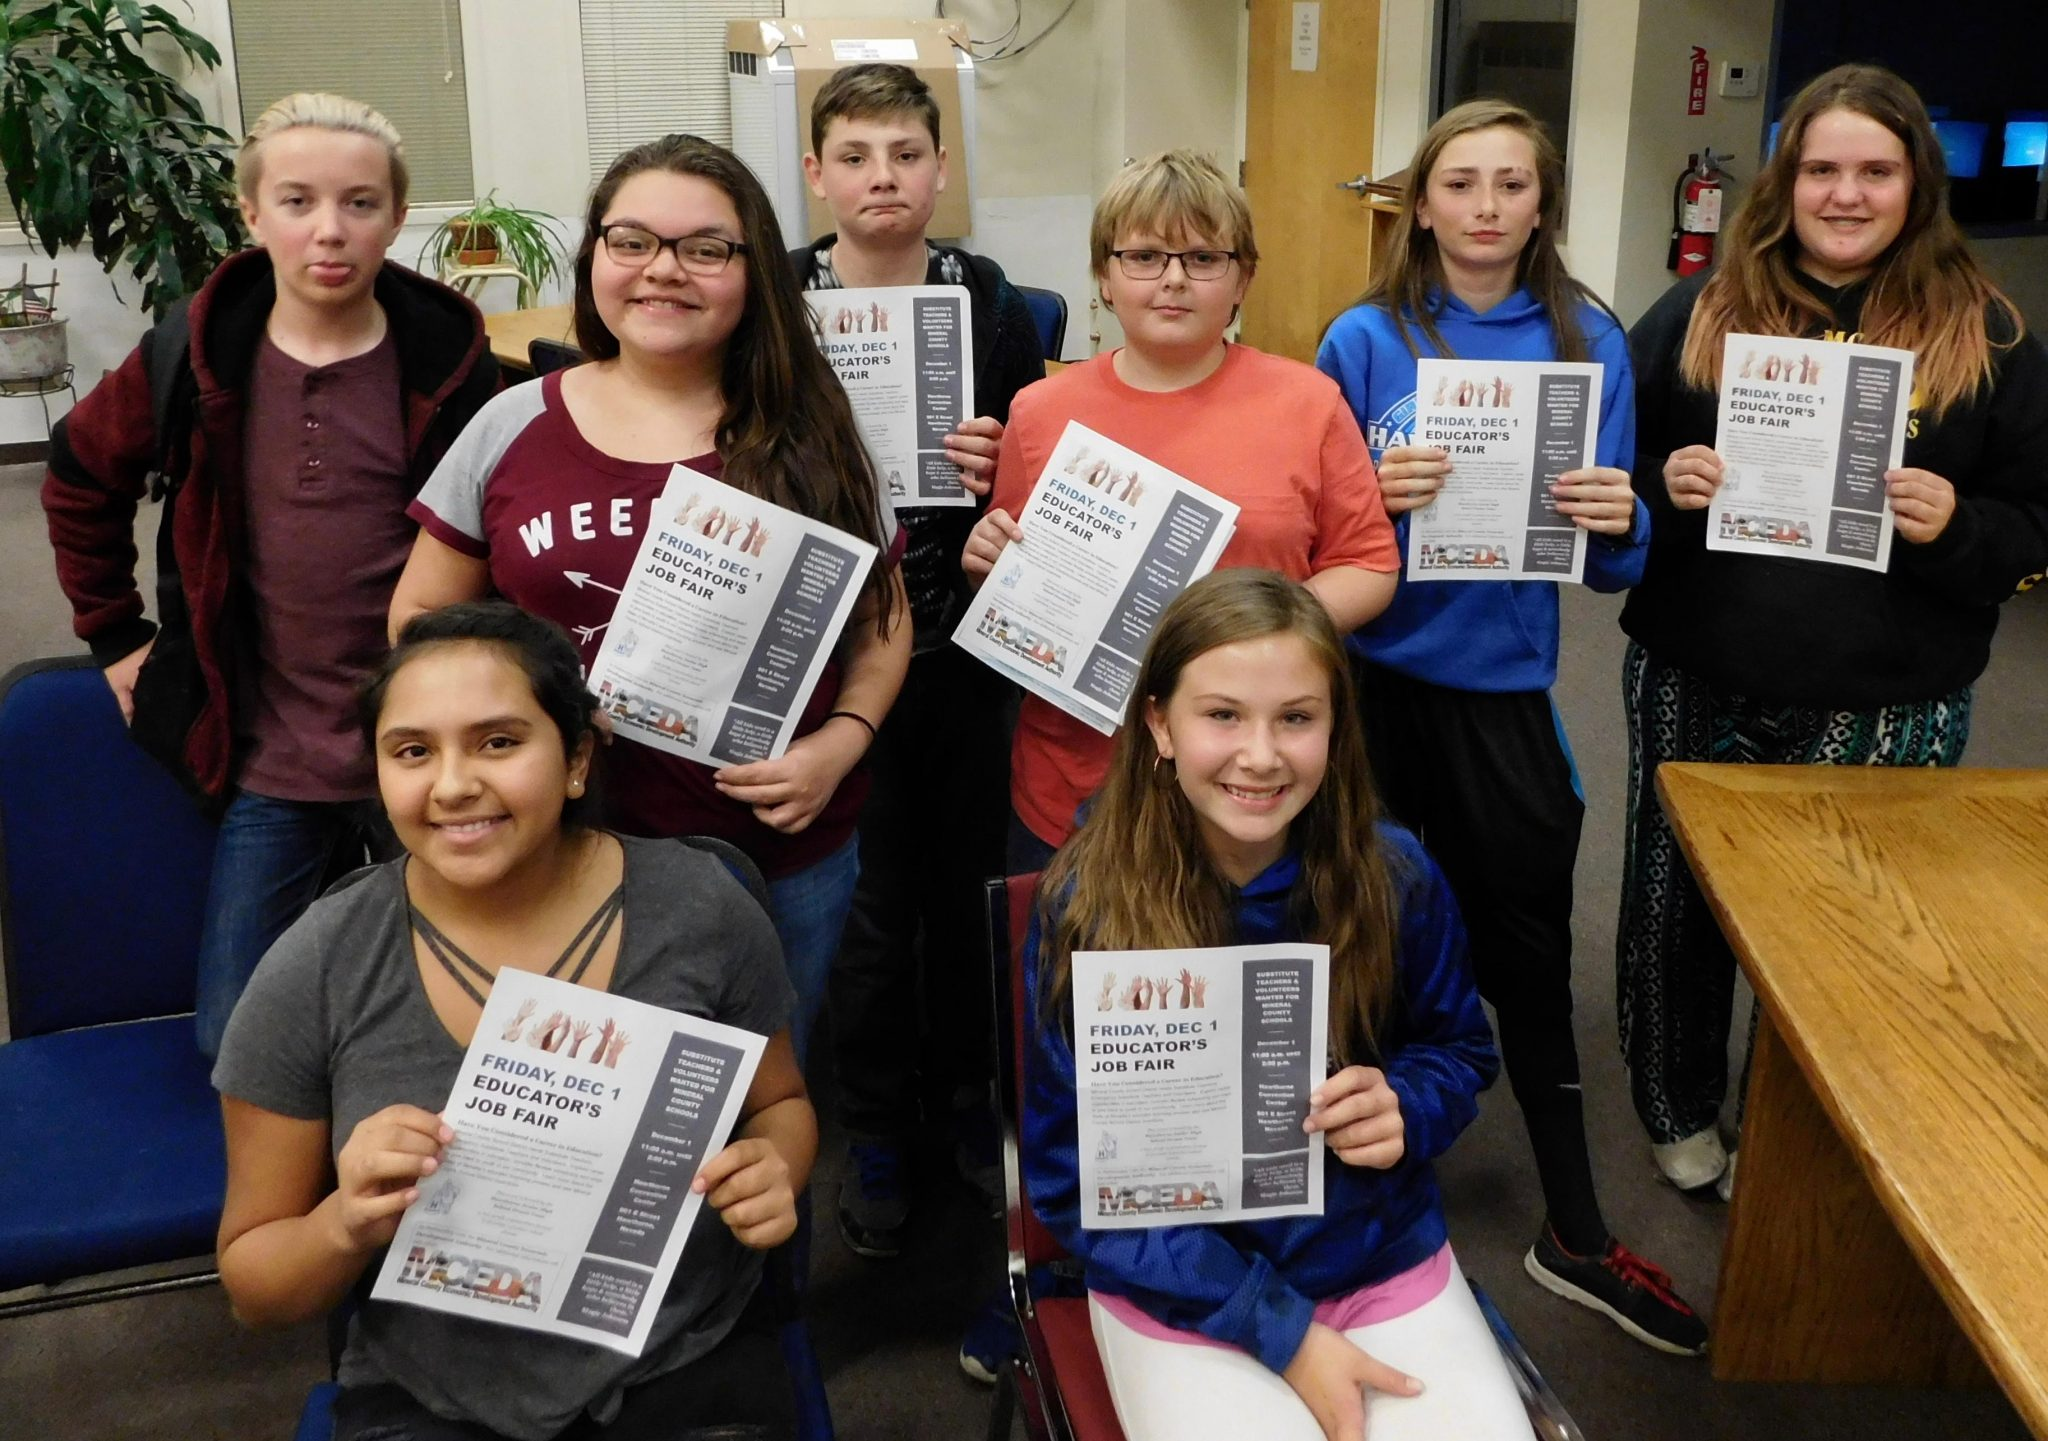 Local Students Helping Conduct Teacher Job Fair